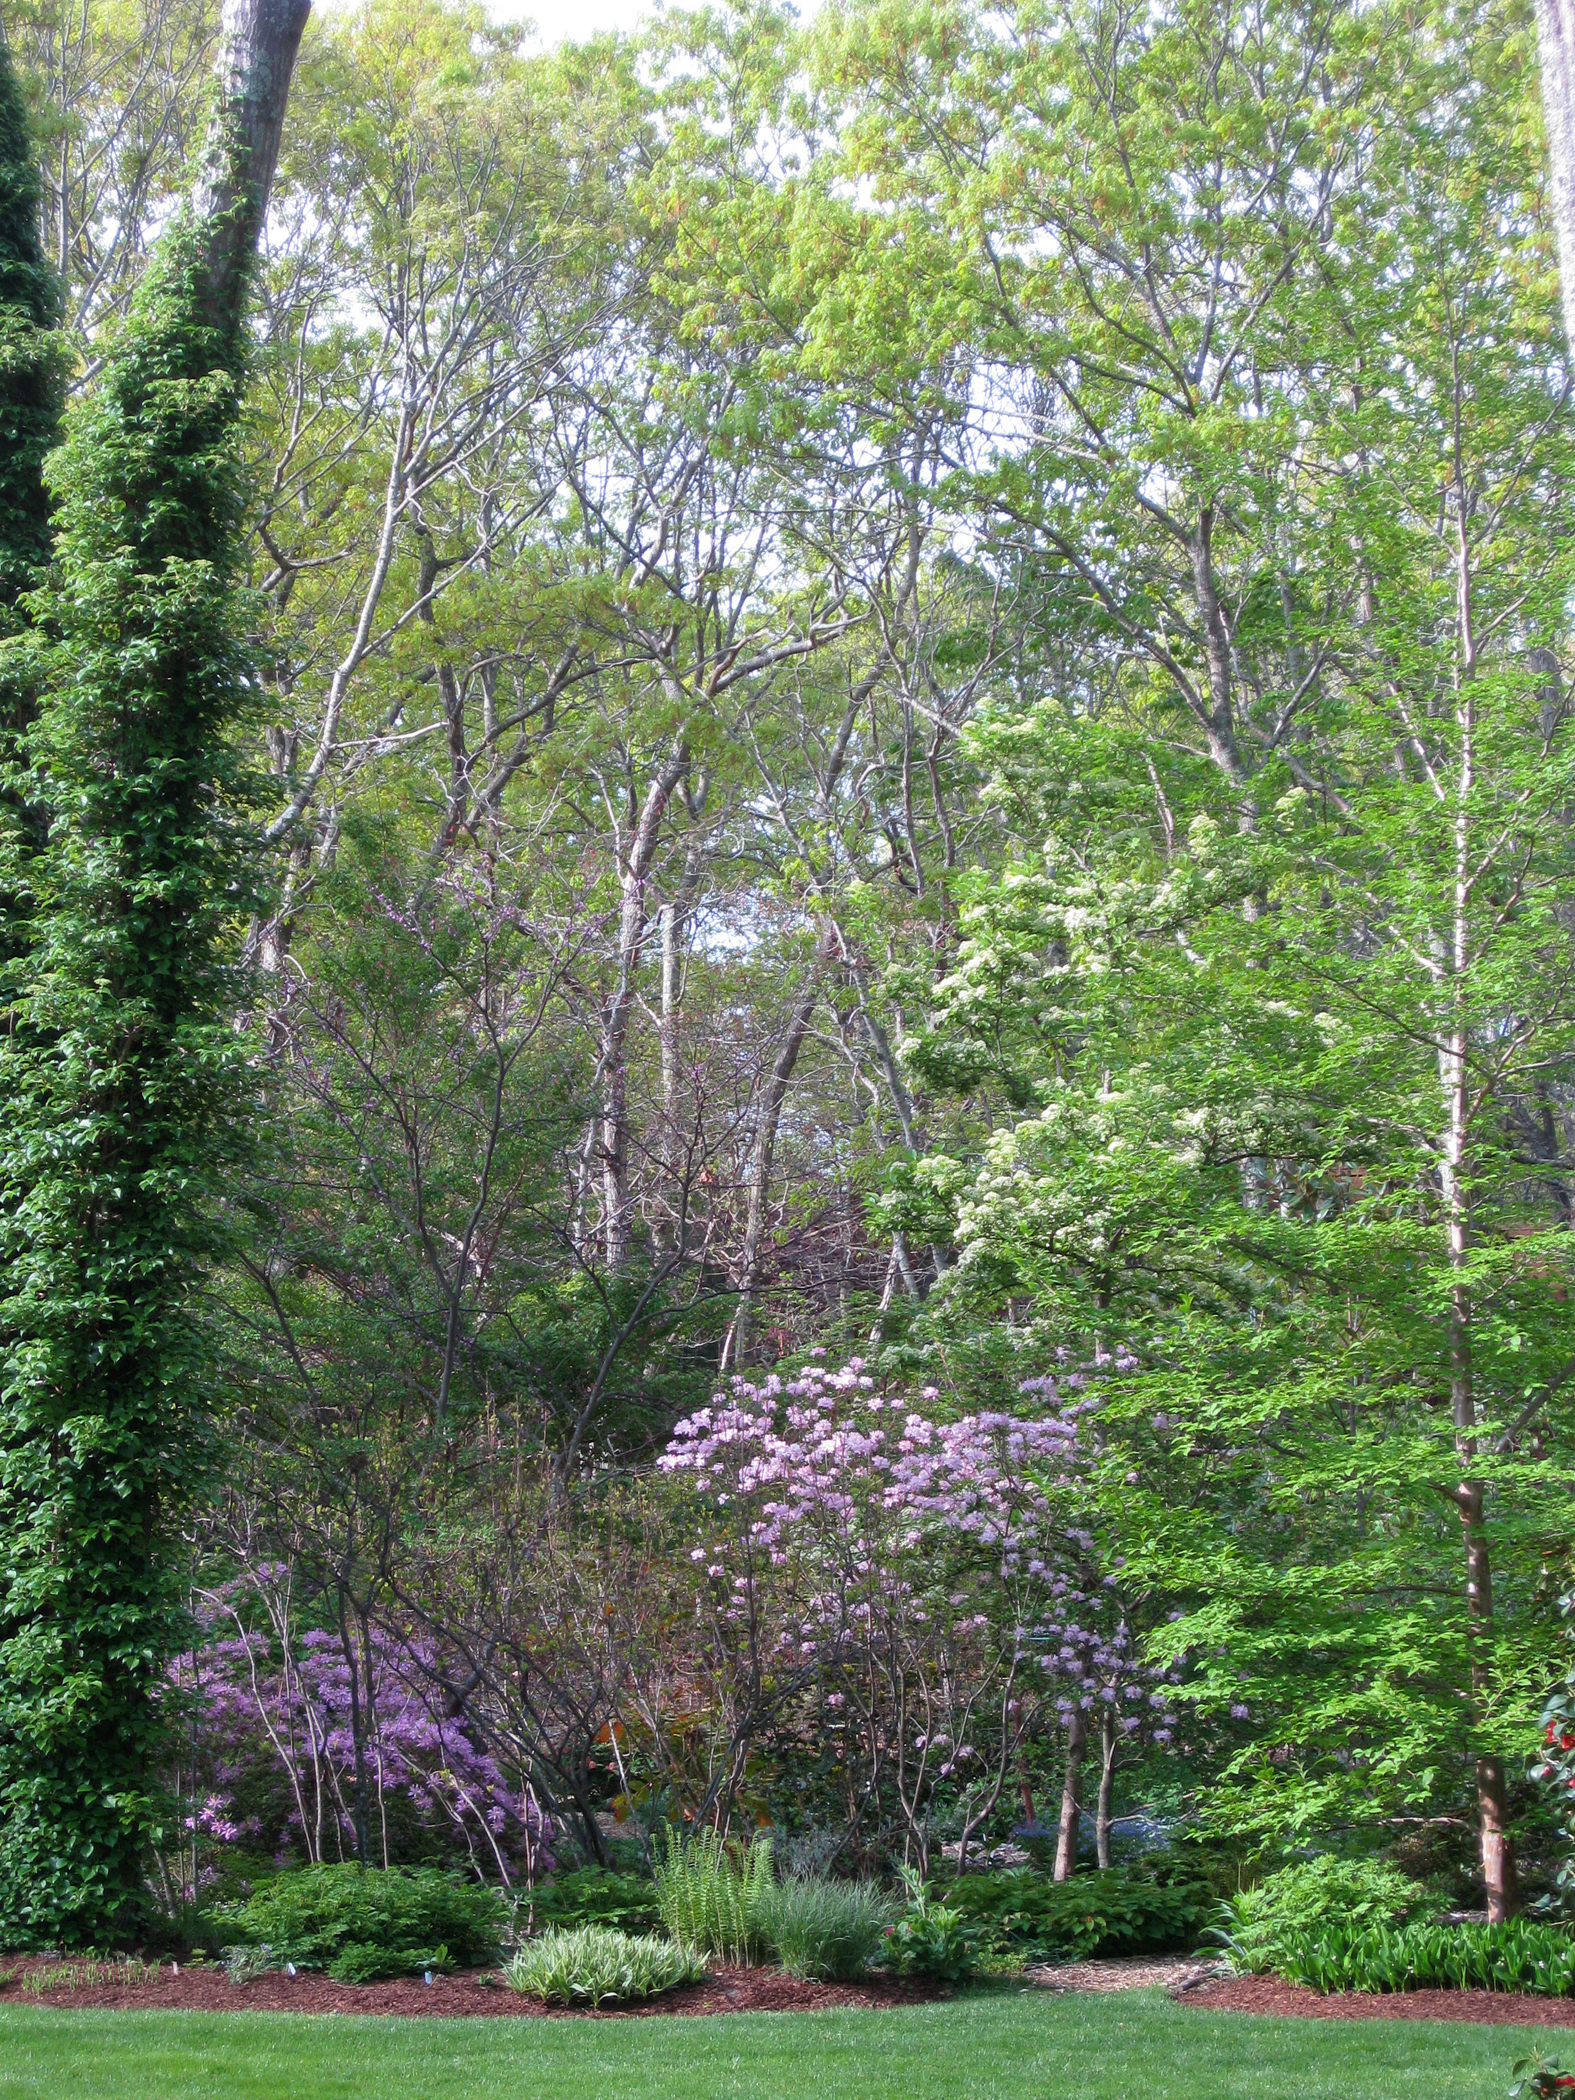 The Garden Conservancy Announces Private Garden Tour Program Beginning Saturday May 10th